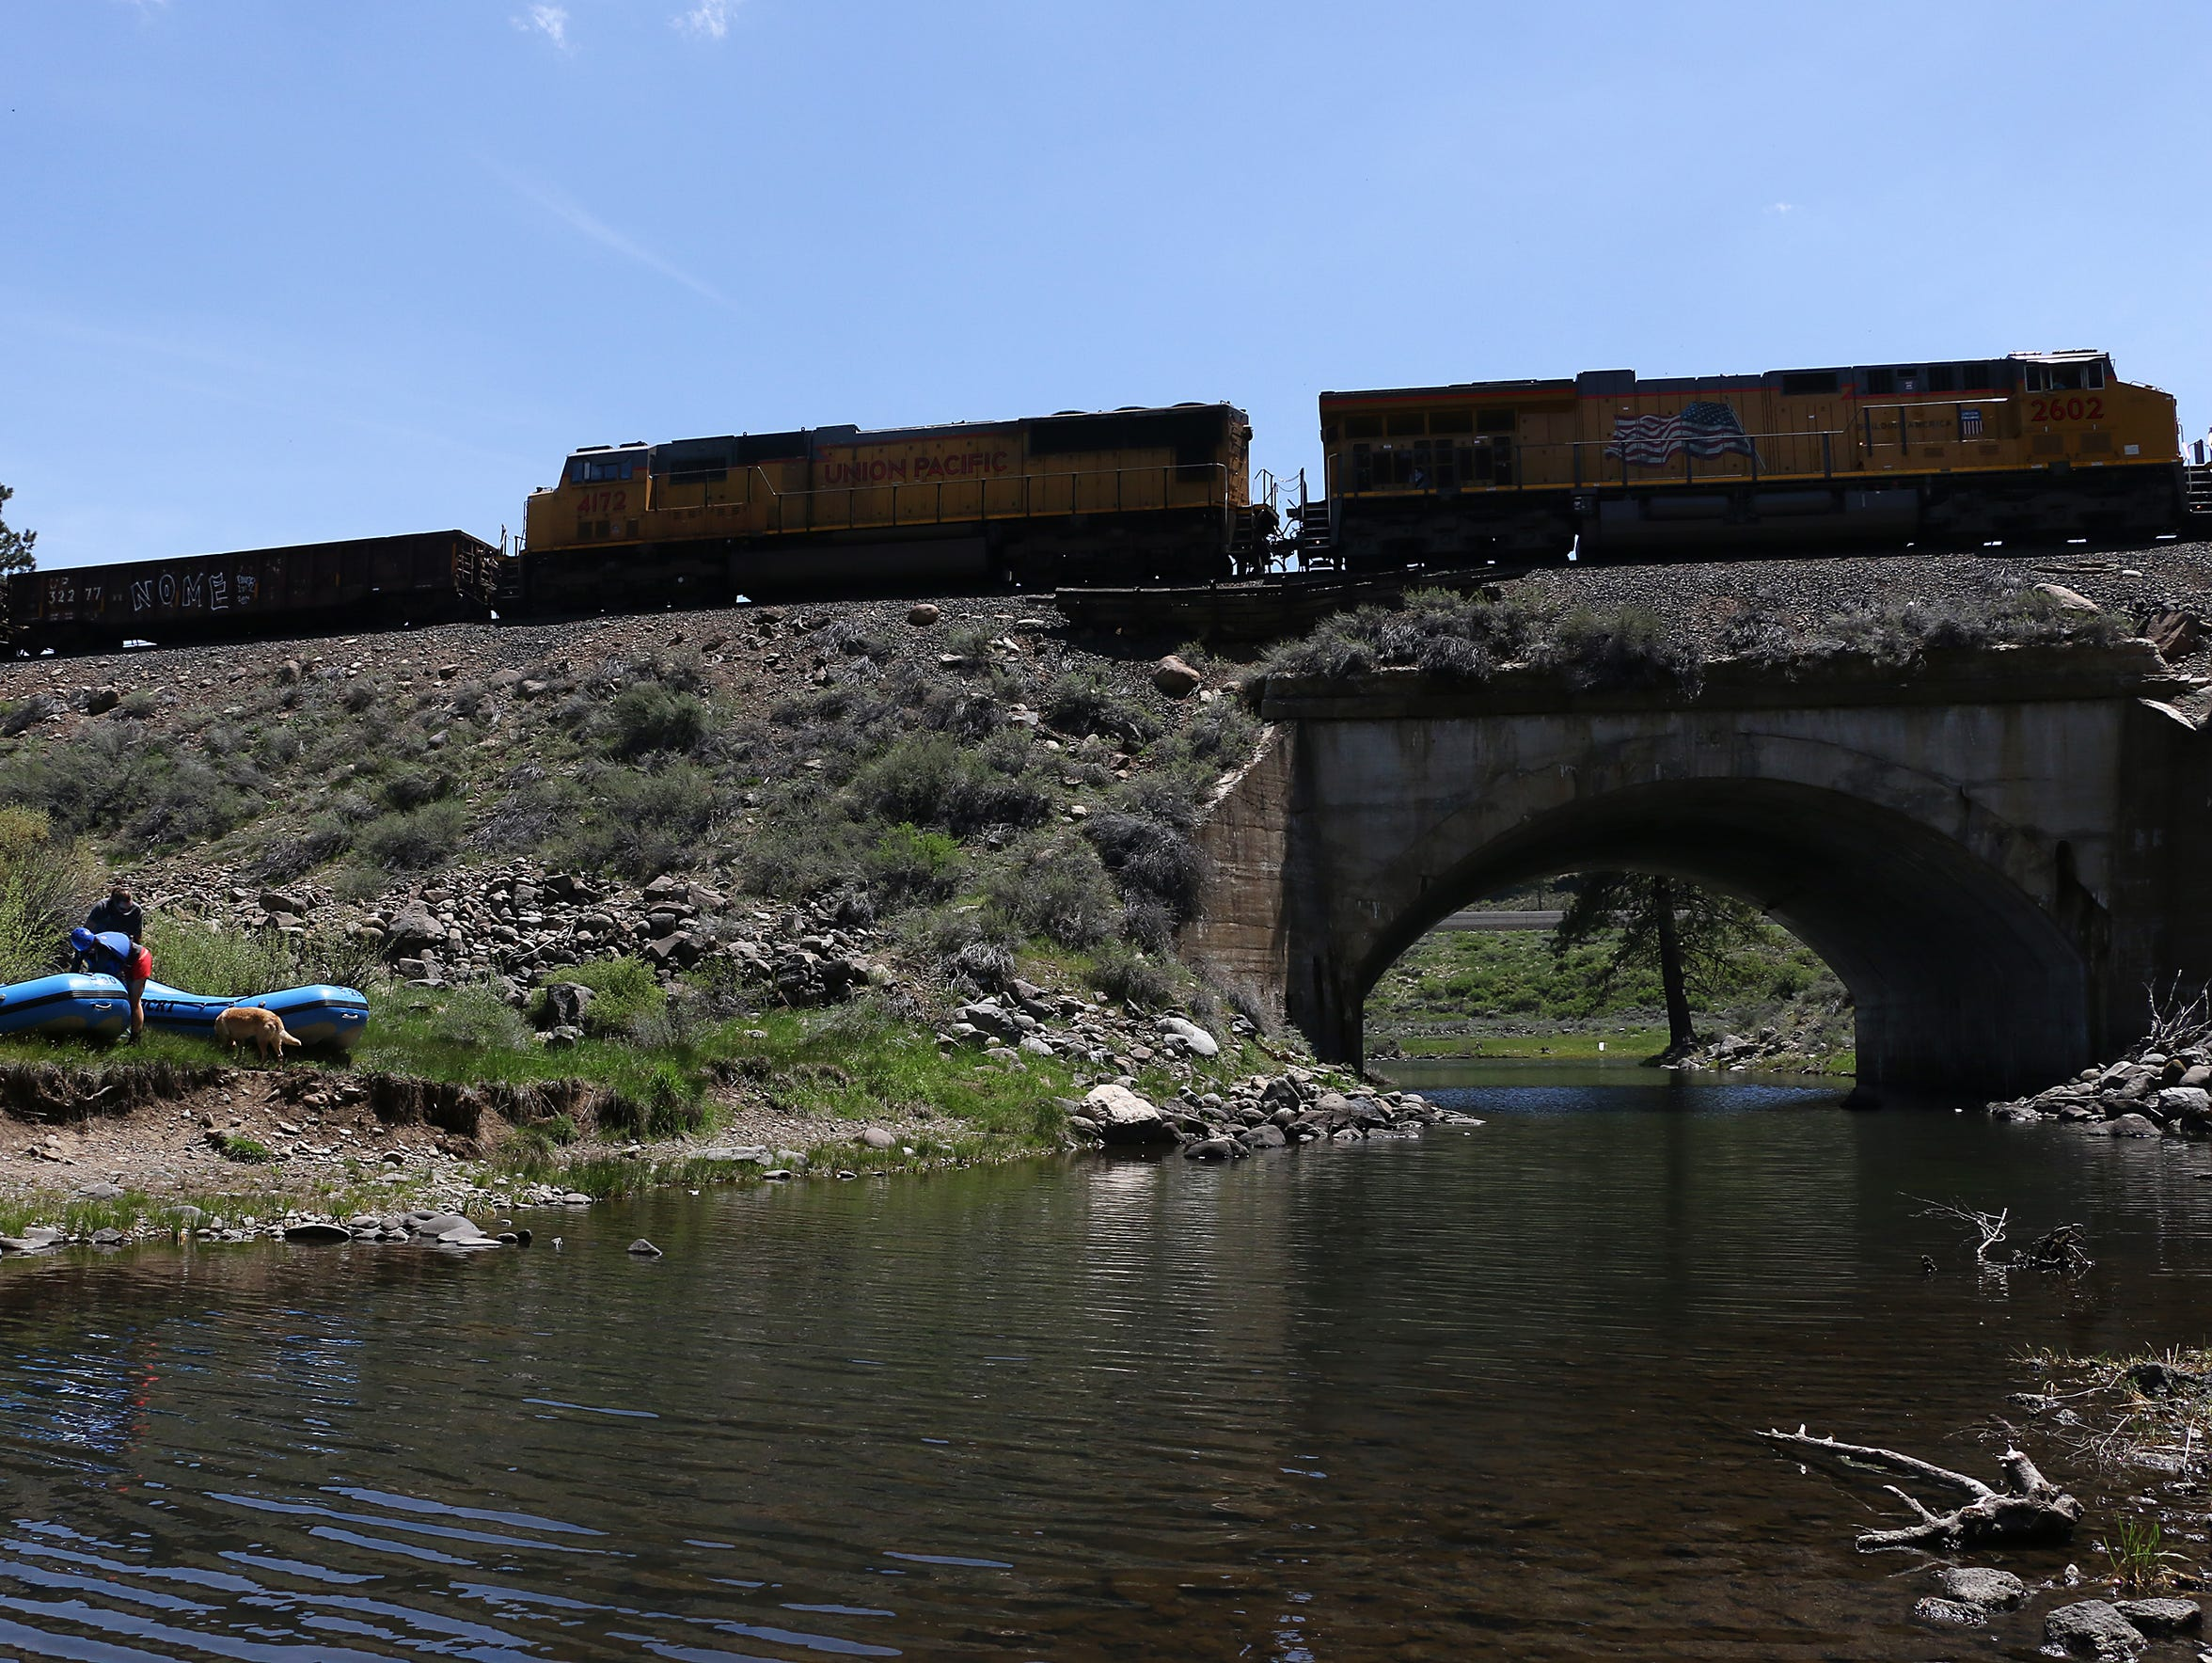 Railroad tracks parallel the Truckee River. RGJ reporters